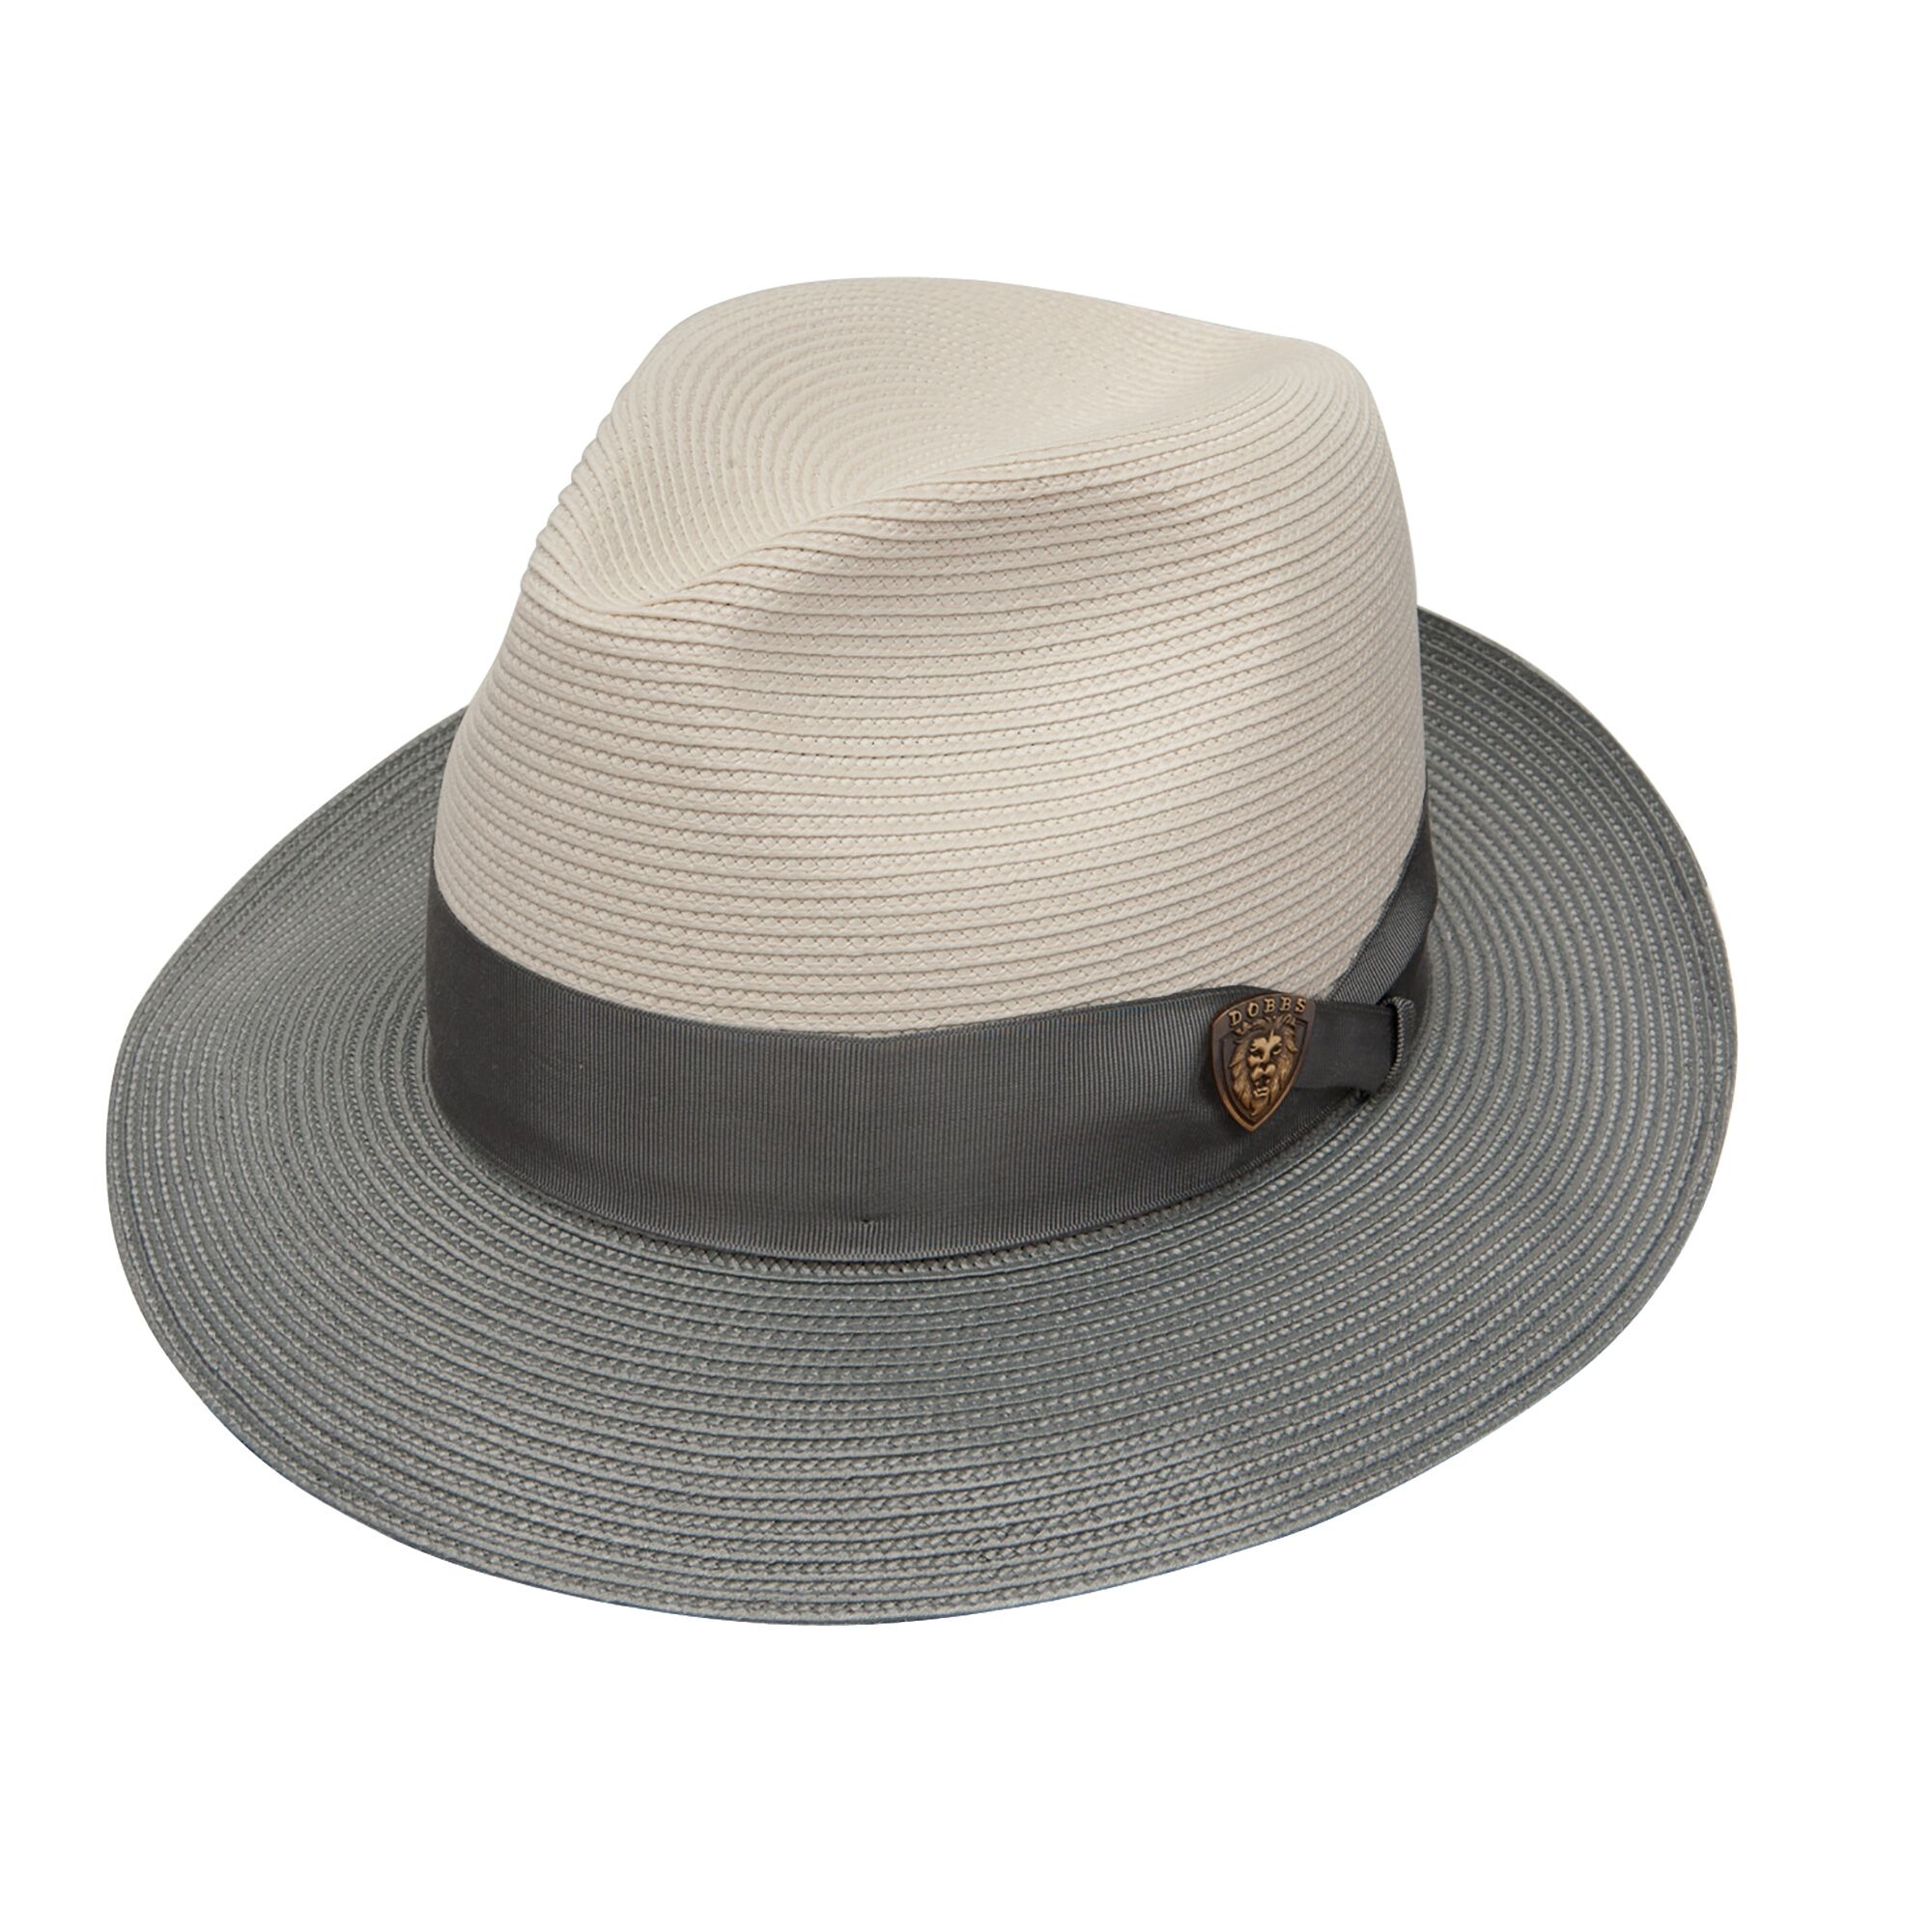 Dobbs Toledo - Milan Straw Fedora Hat